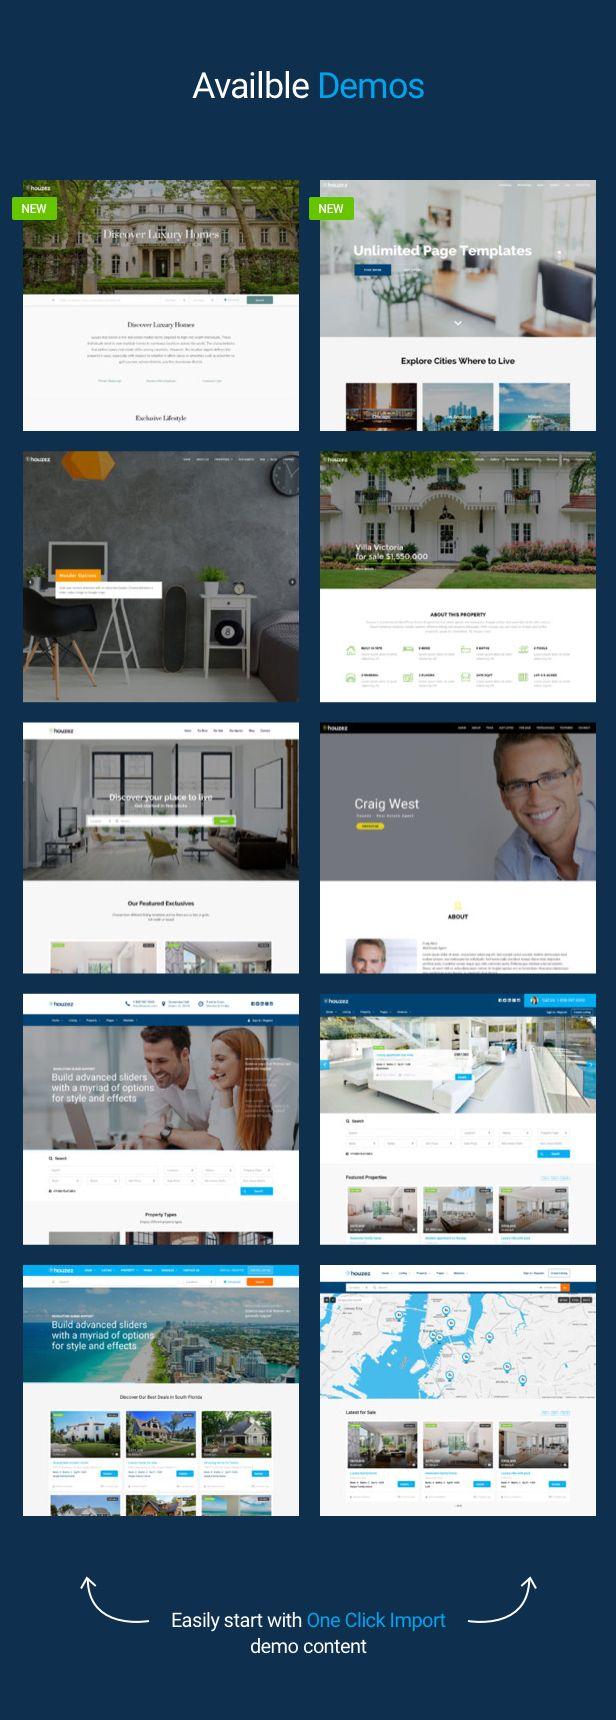 Houzez - Real Estate WordPress Theme by favethemes | ThemeForest